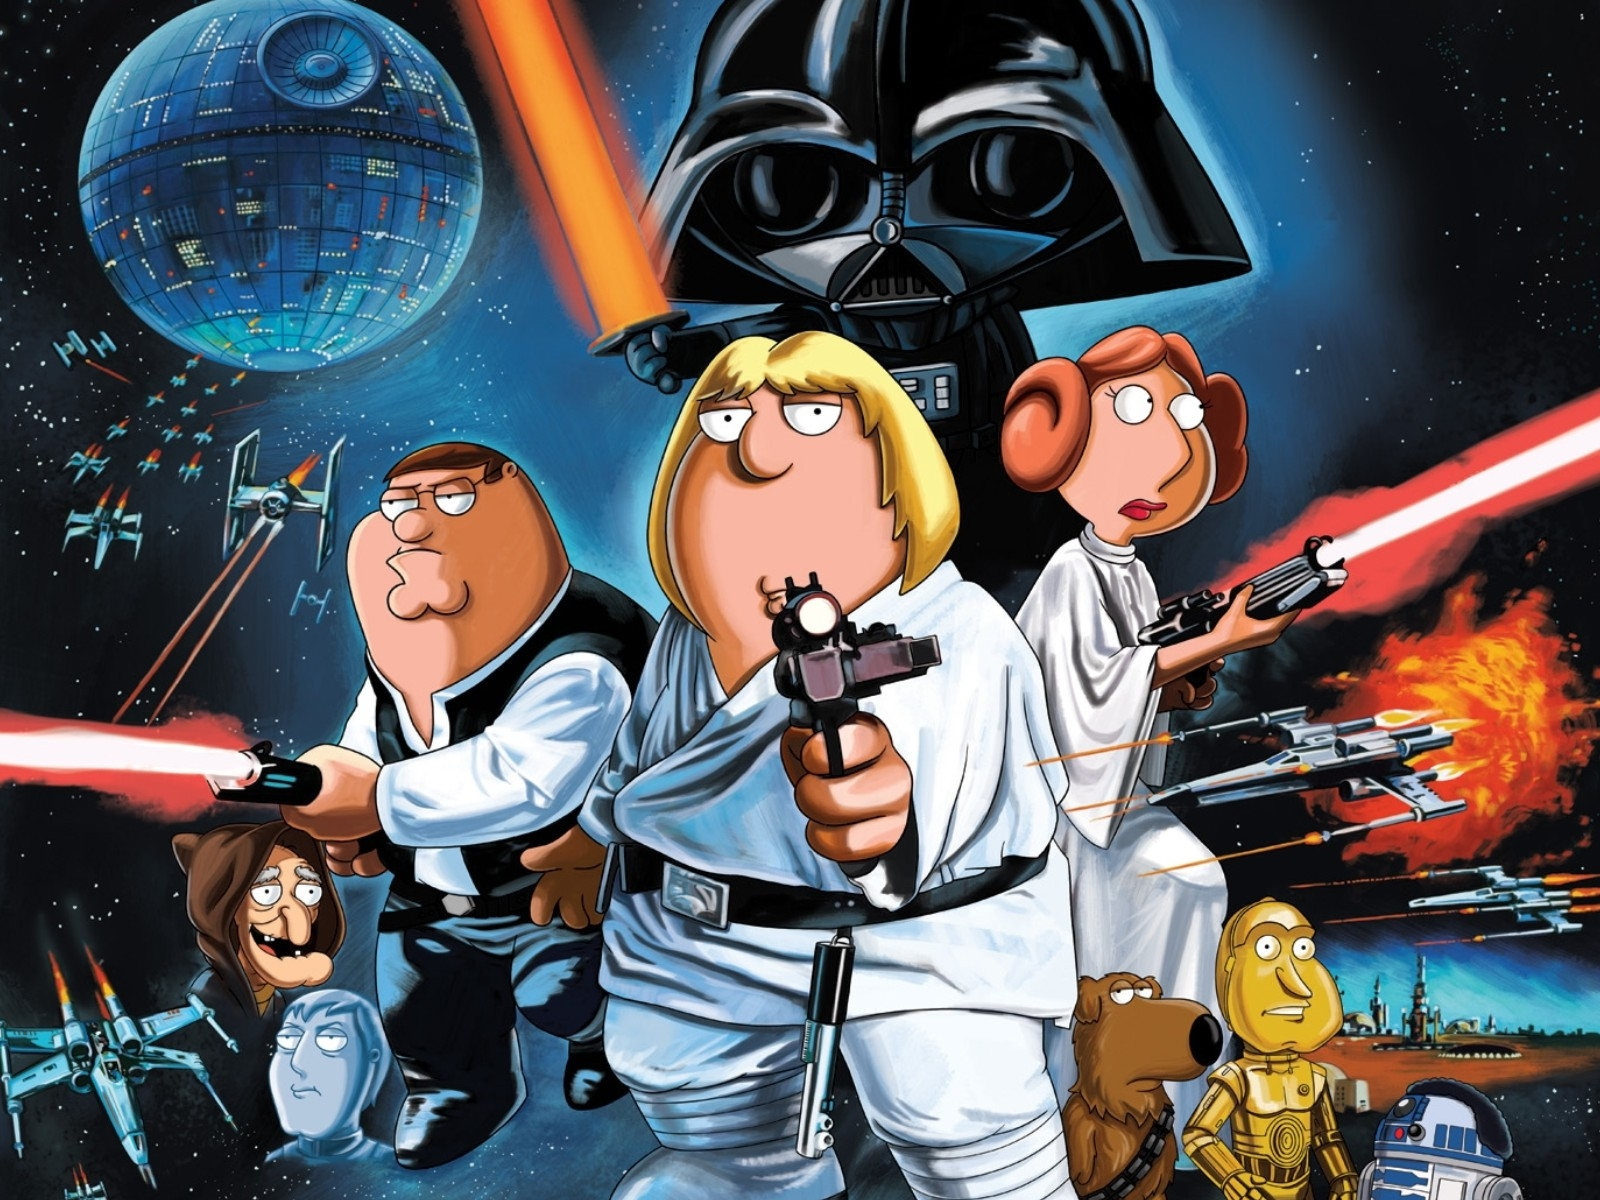 54 Wallpapers Star Wars Hd Variados Fondos De Pantalla